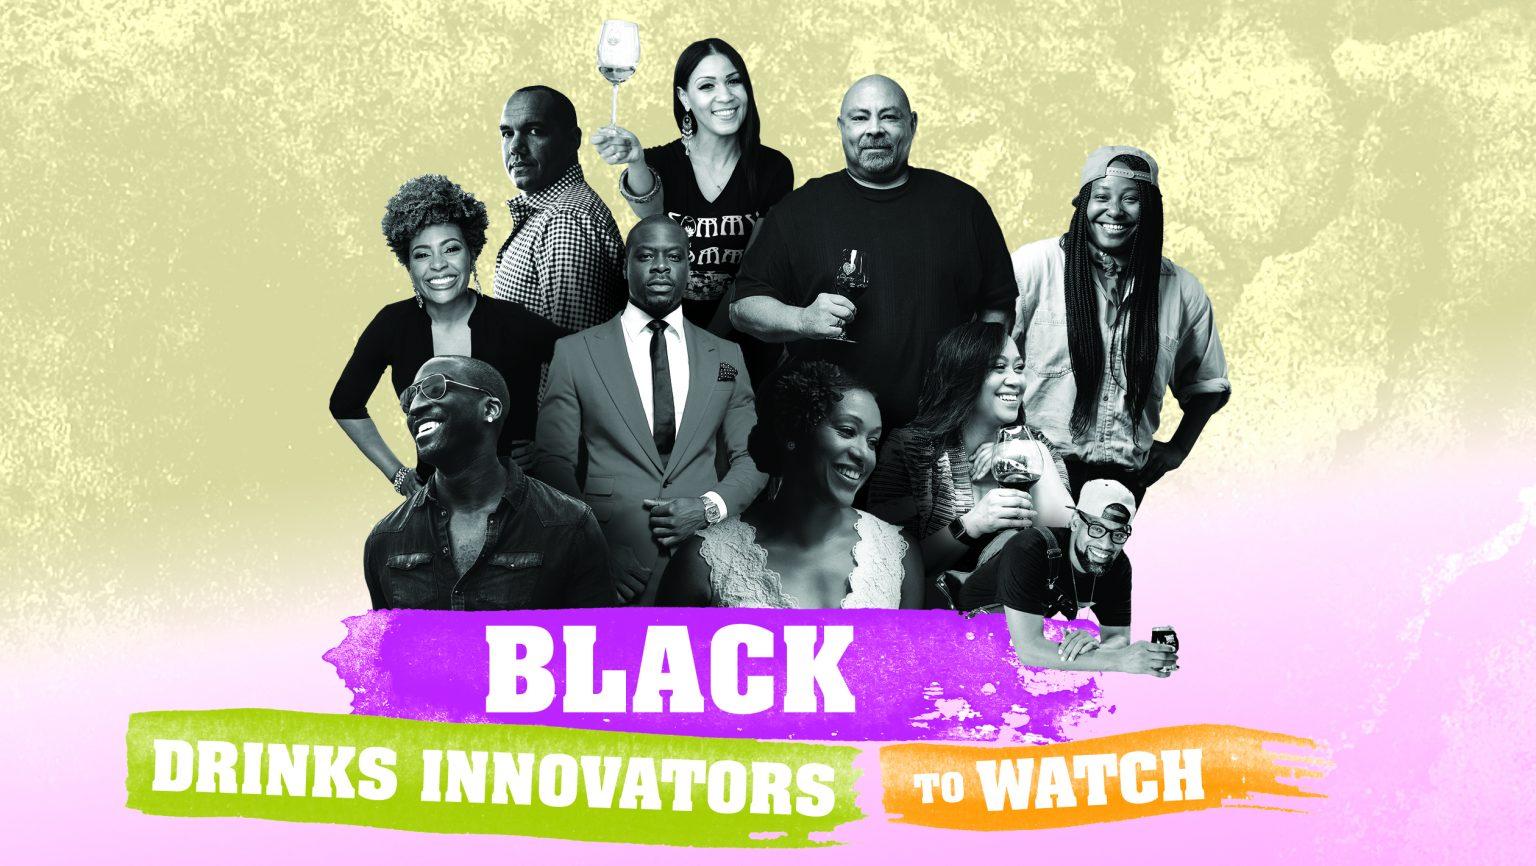 Black Drinks Innovators photo